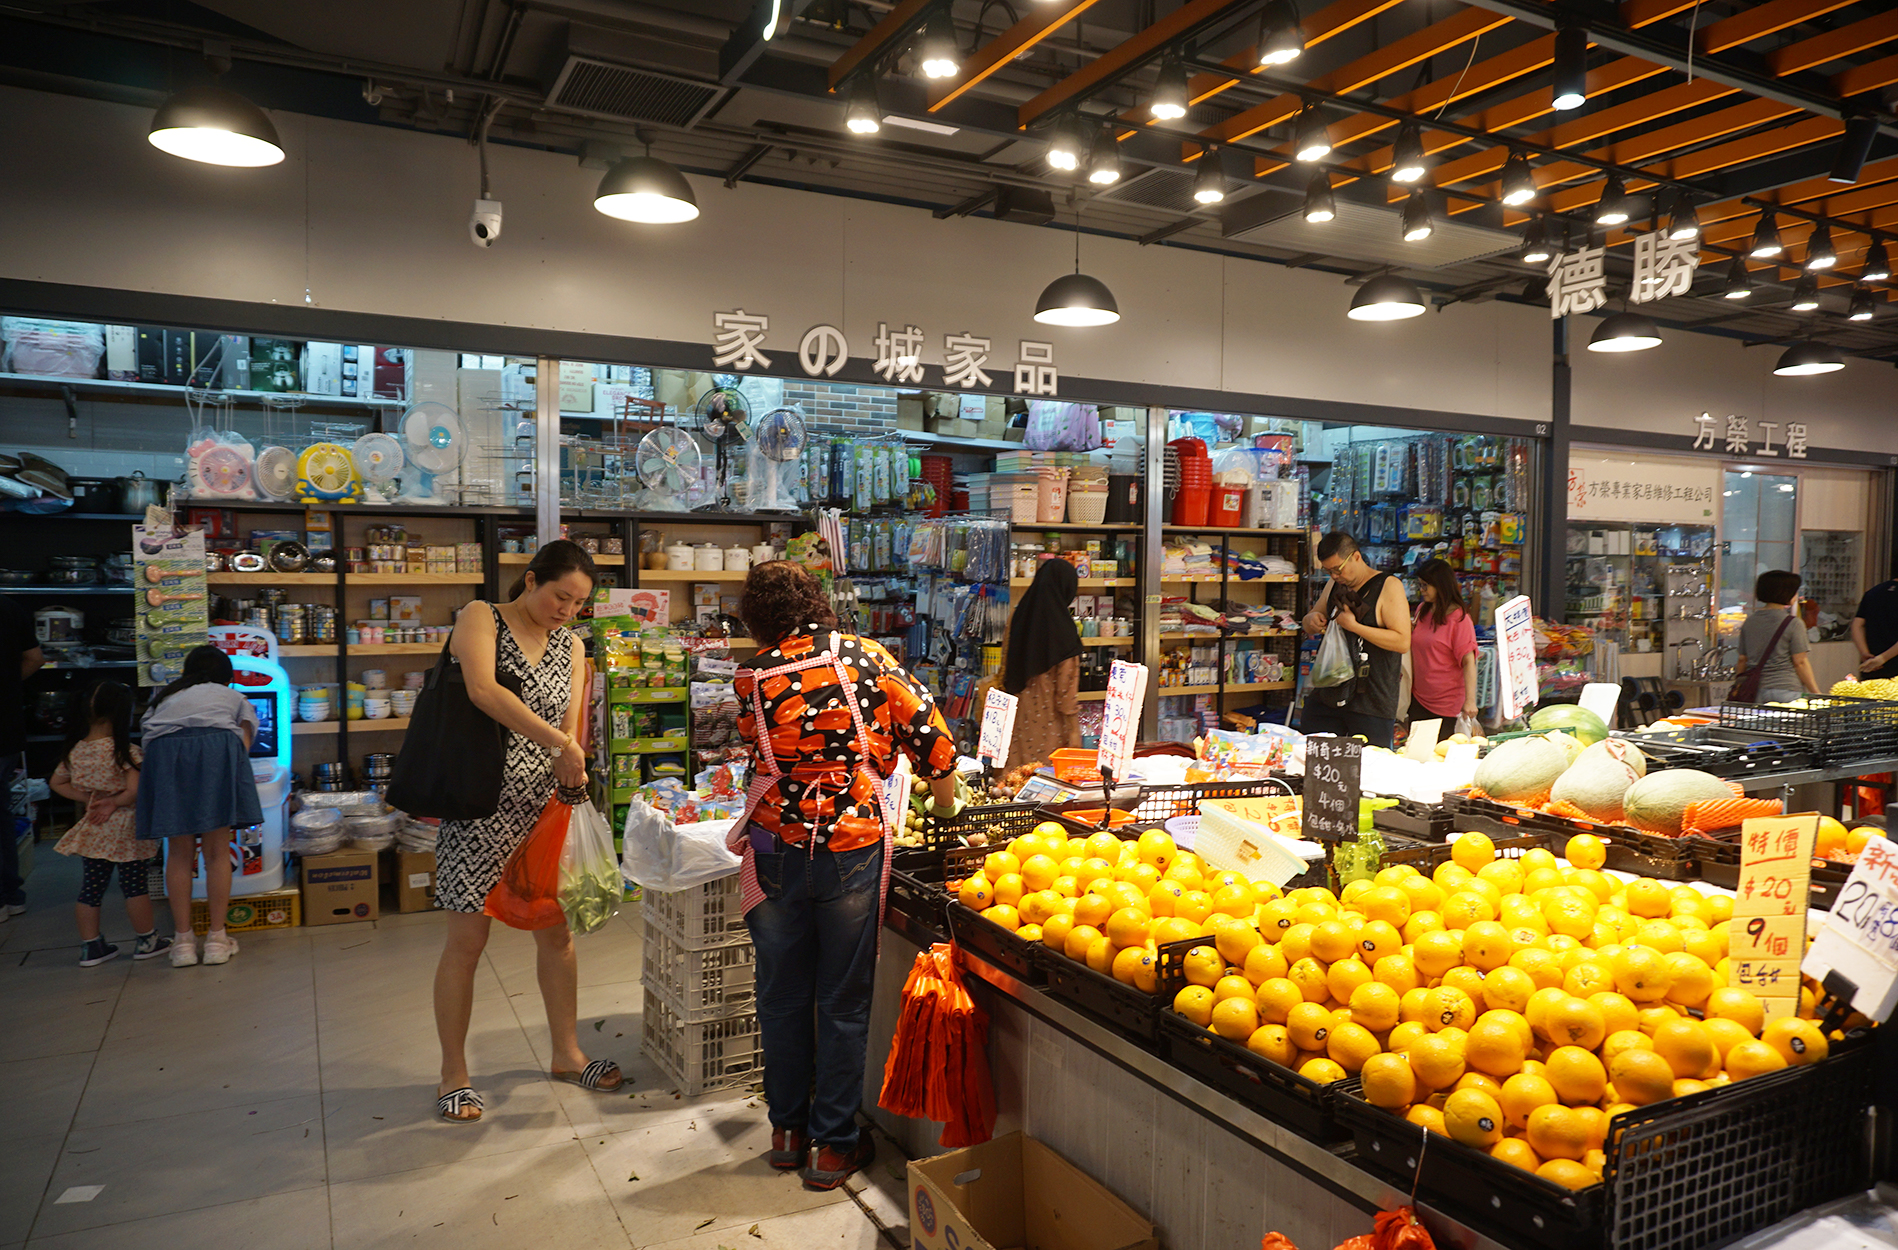 File K Mart Fresh Market Fruit Stall Housewares And Home Repair Engineering Store Jpg Wikimedia Commons